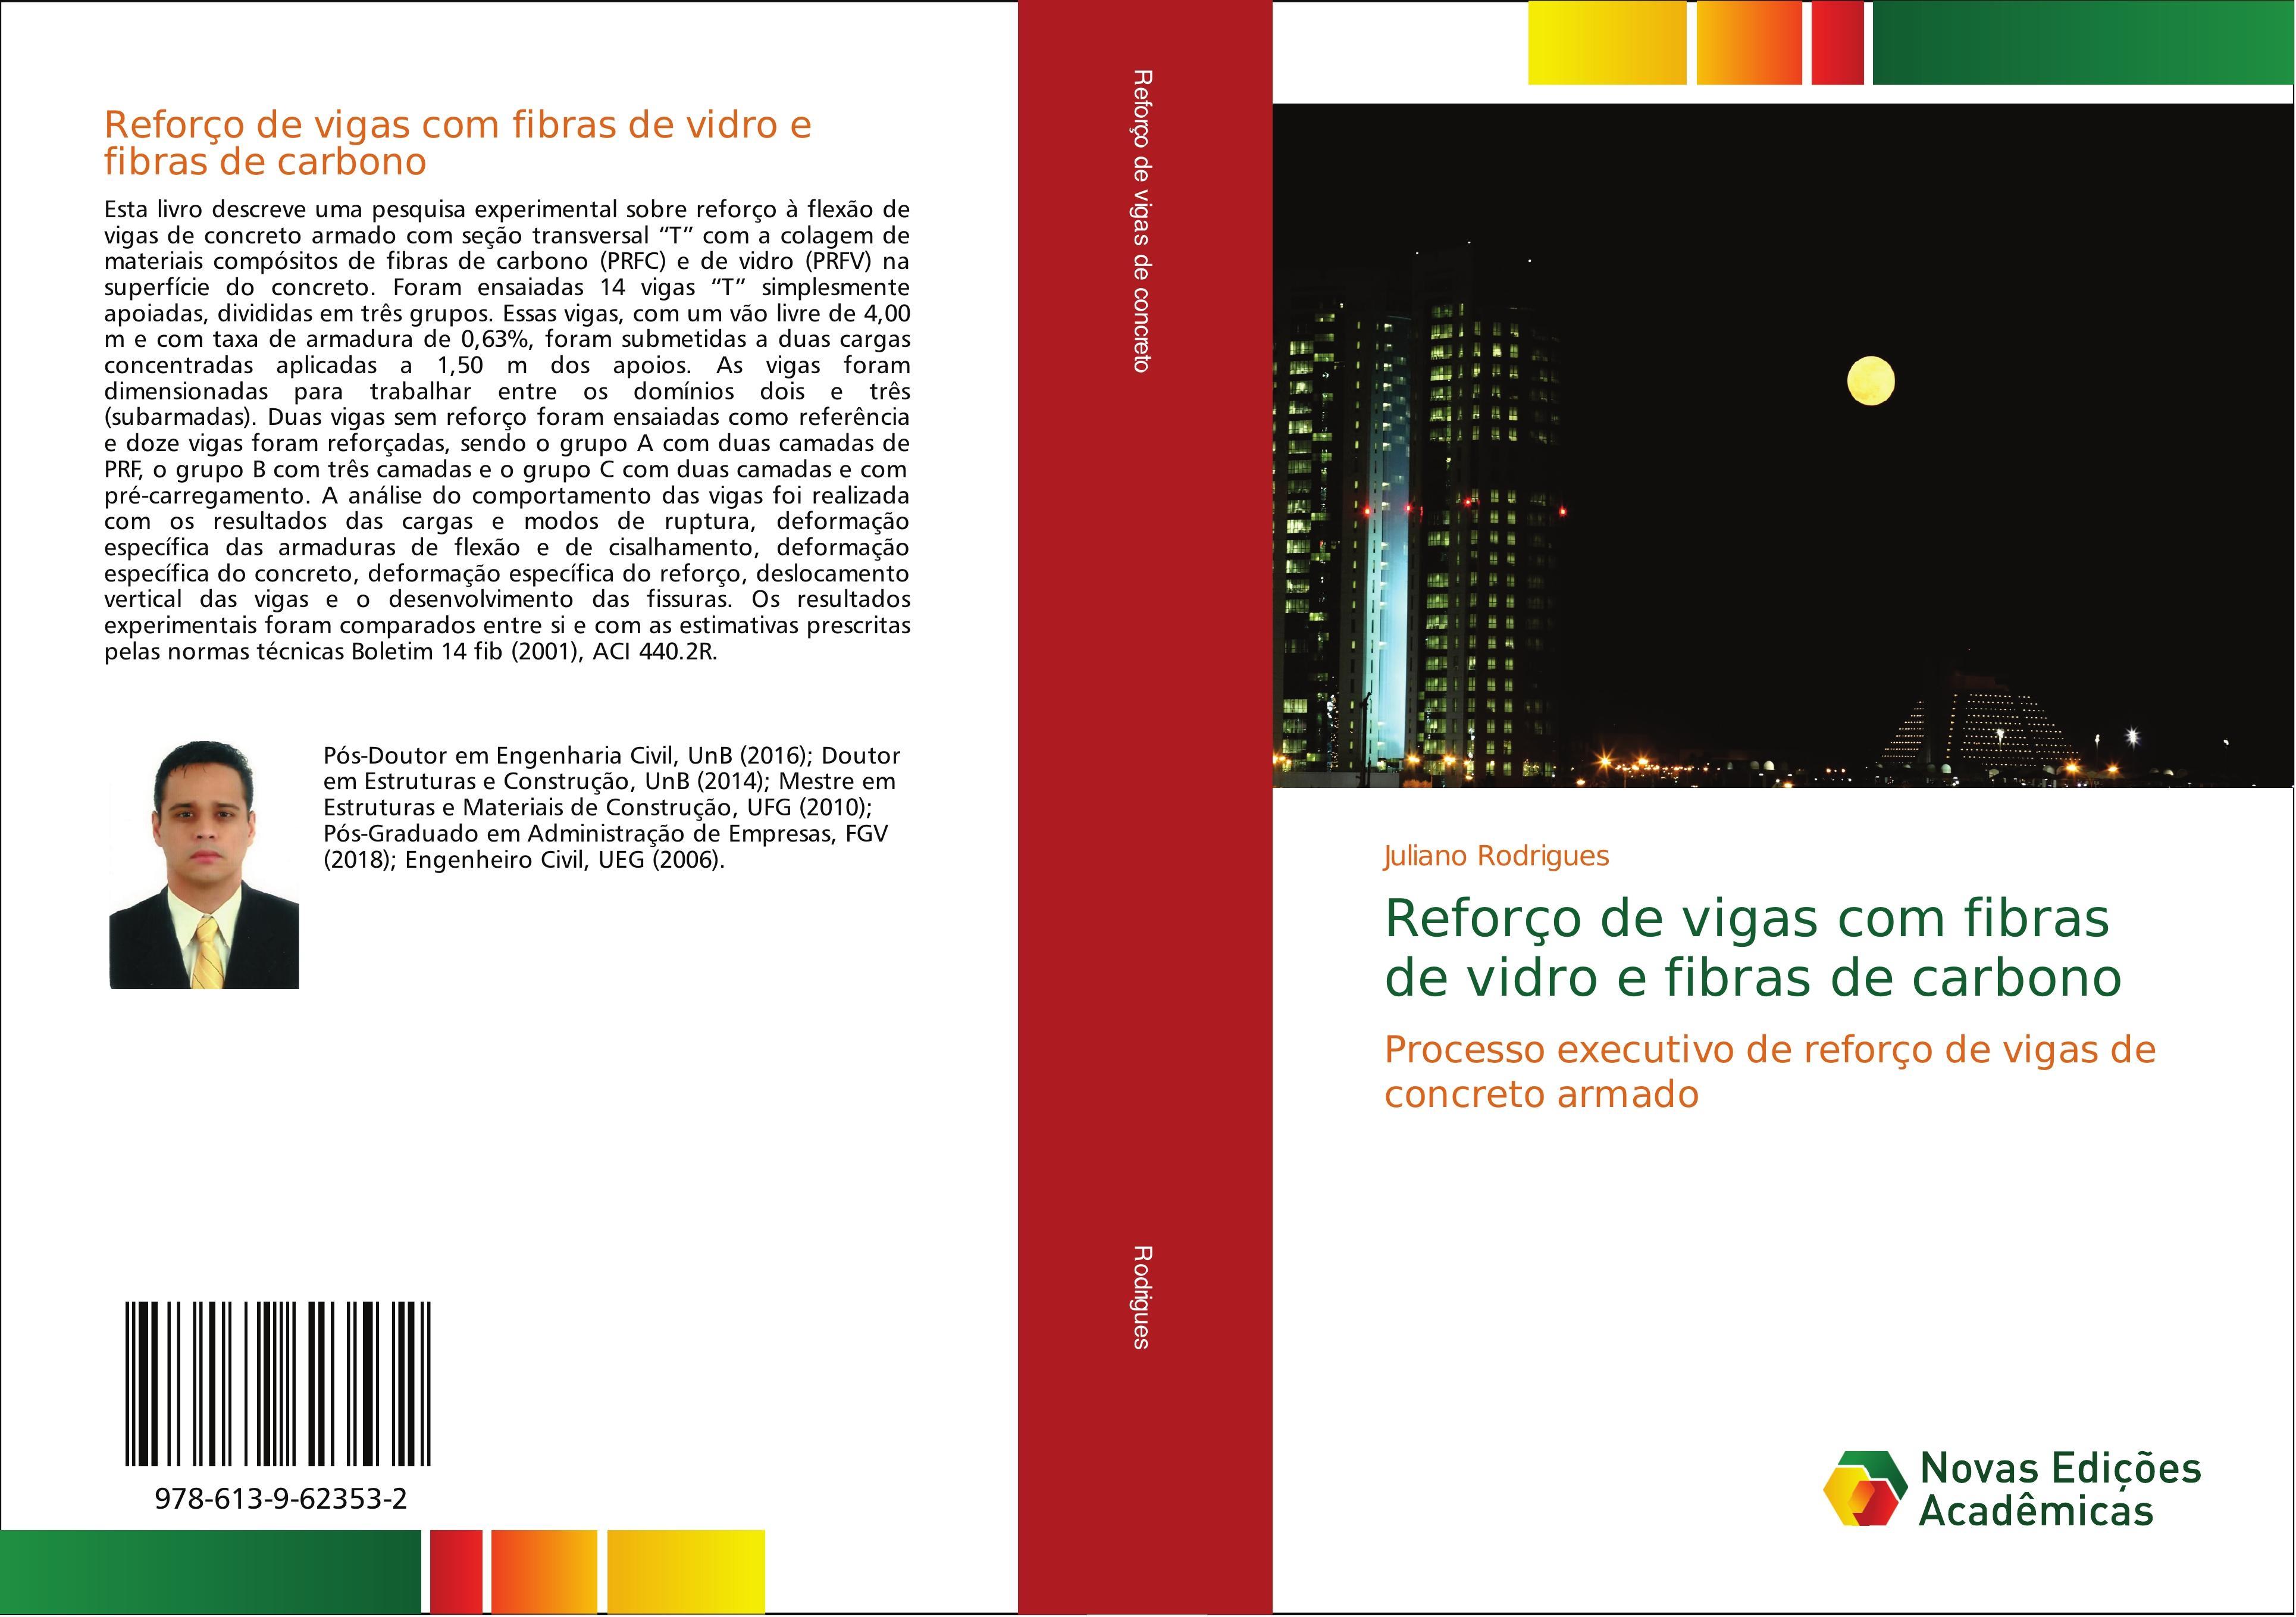 Reforço de vigas com fibras de vidro e fibras de carbono  Juliano Rodrigues  Taschenbuch  Portugiesisch  2018 - Rodrigues, Juliano